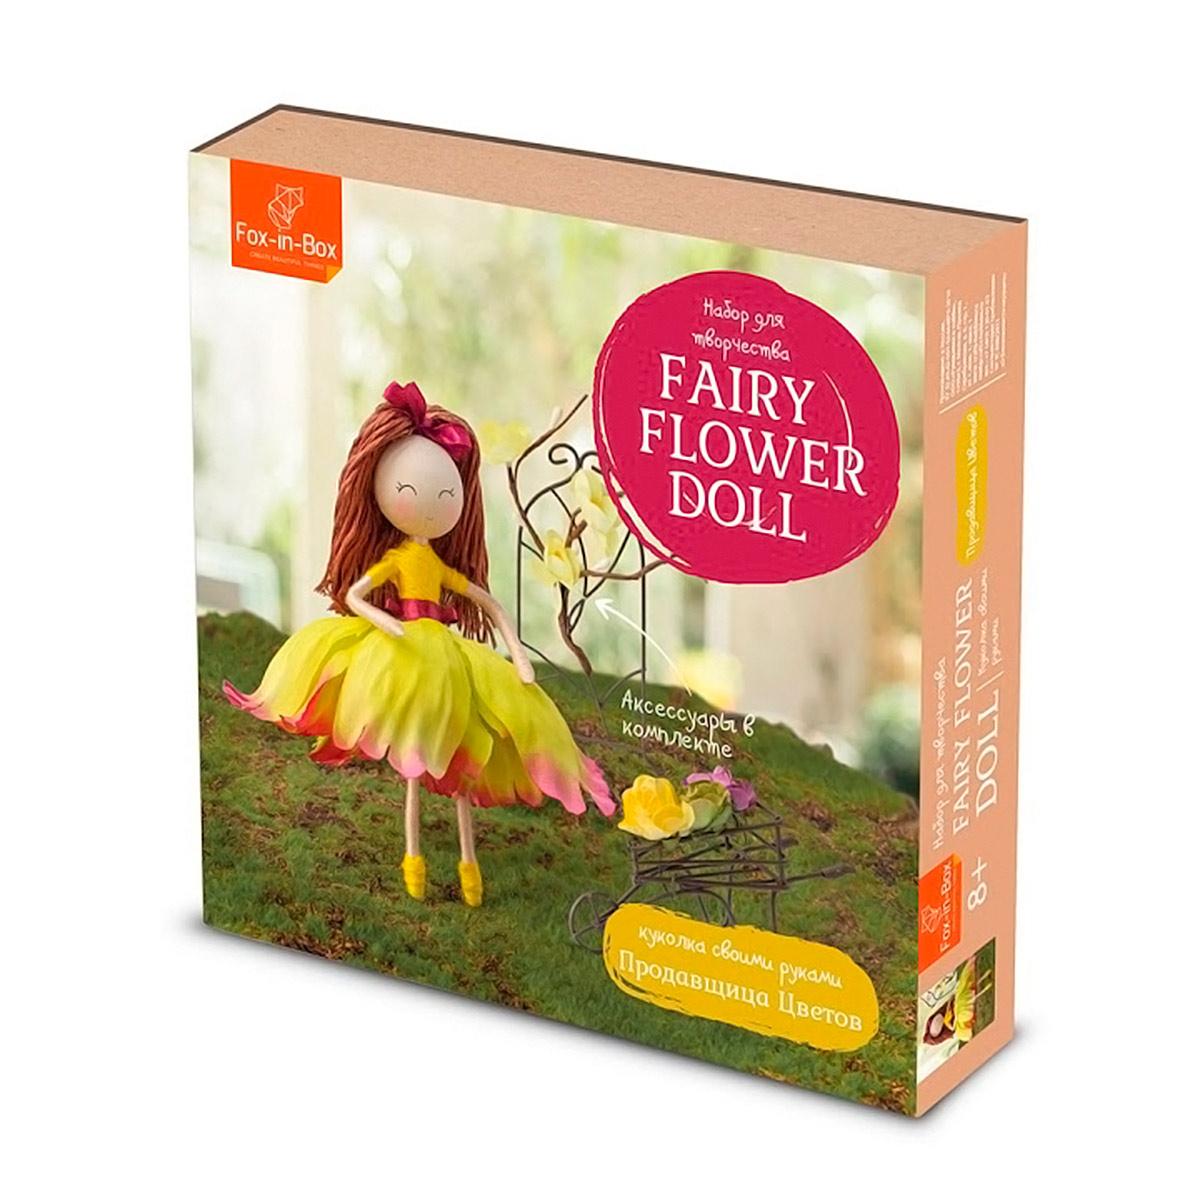 FB606707 Набор для творчества Куколка своими руками 'Продавщица Цветов'